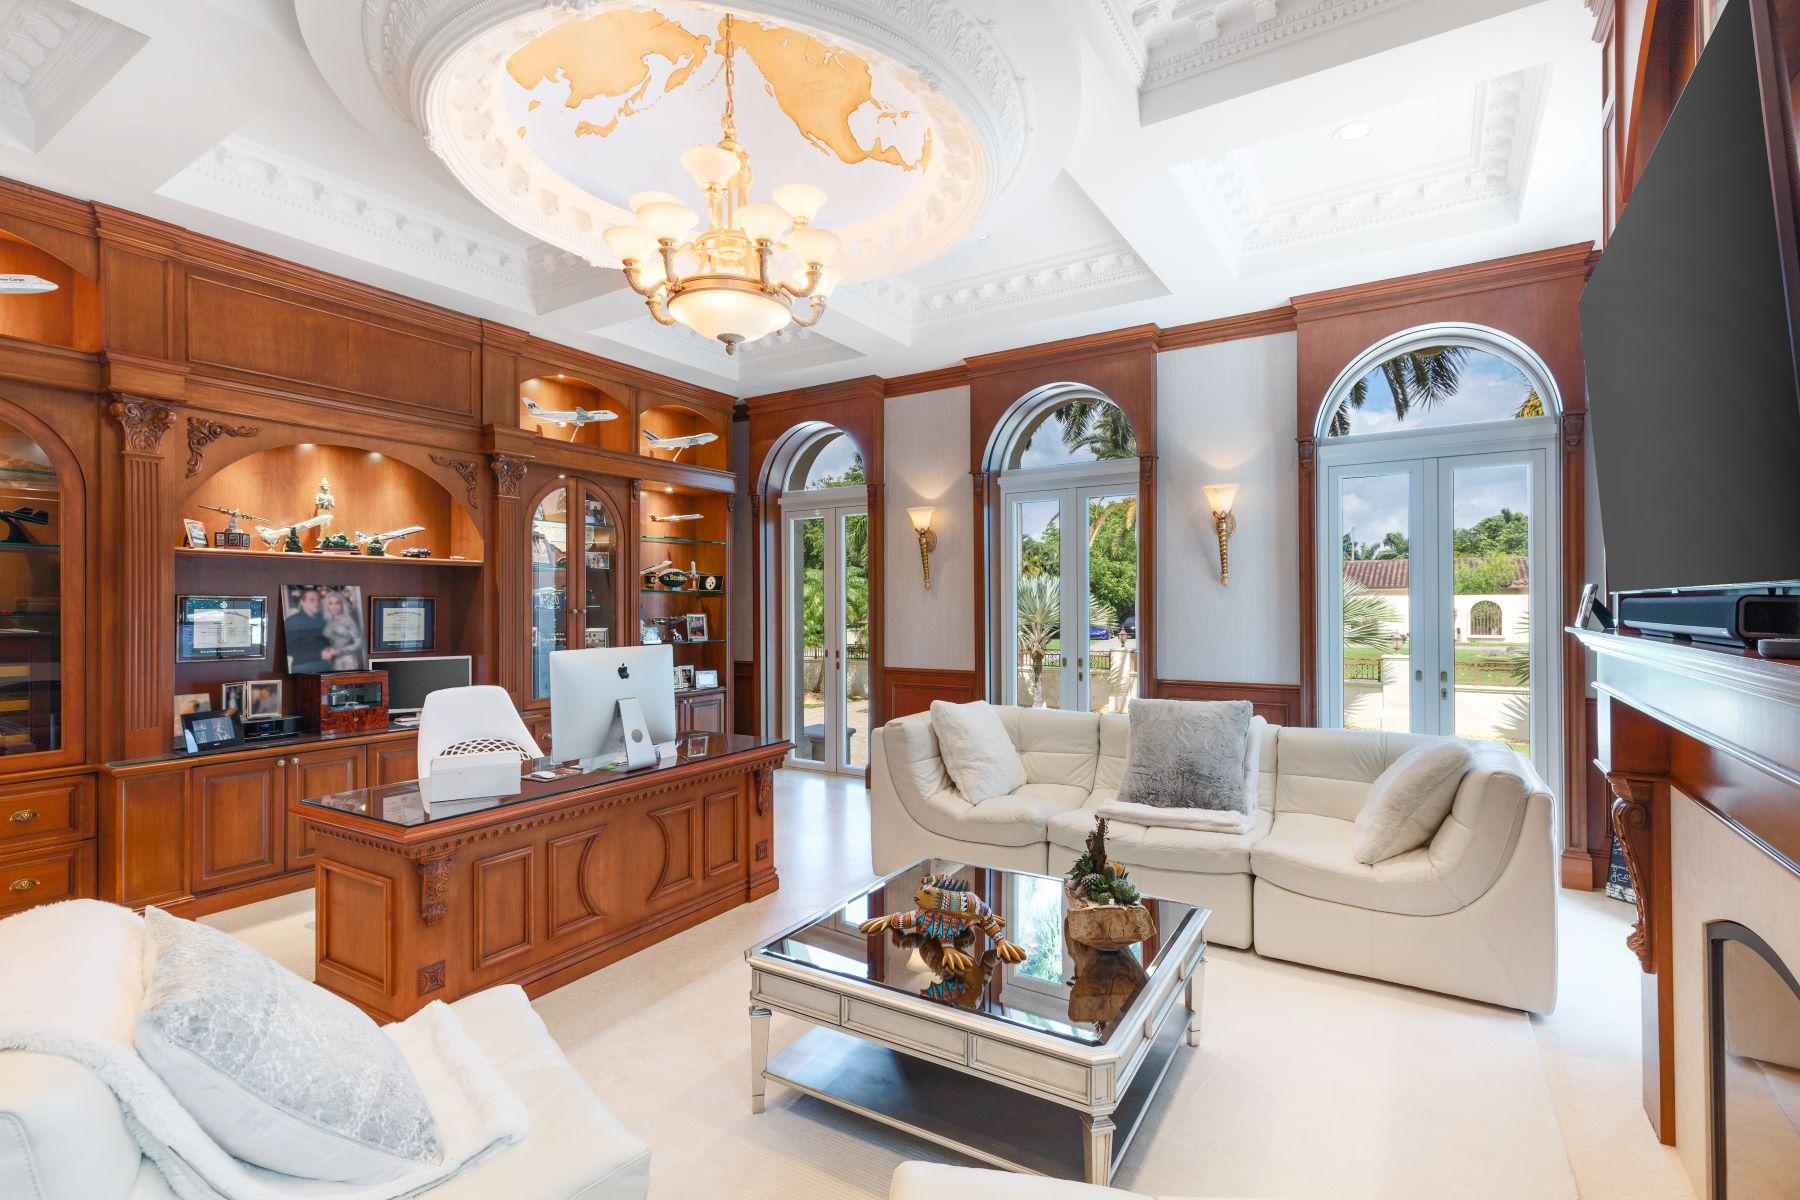 Additional photo for property listing at 530 Arvida Pkwy 科勒尔盖布尔斯, 佛罗里达州 33156 美国